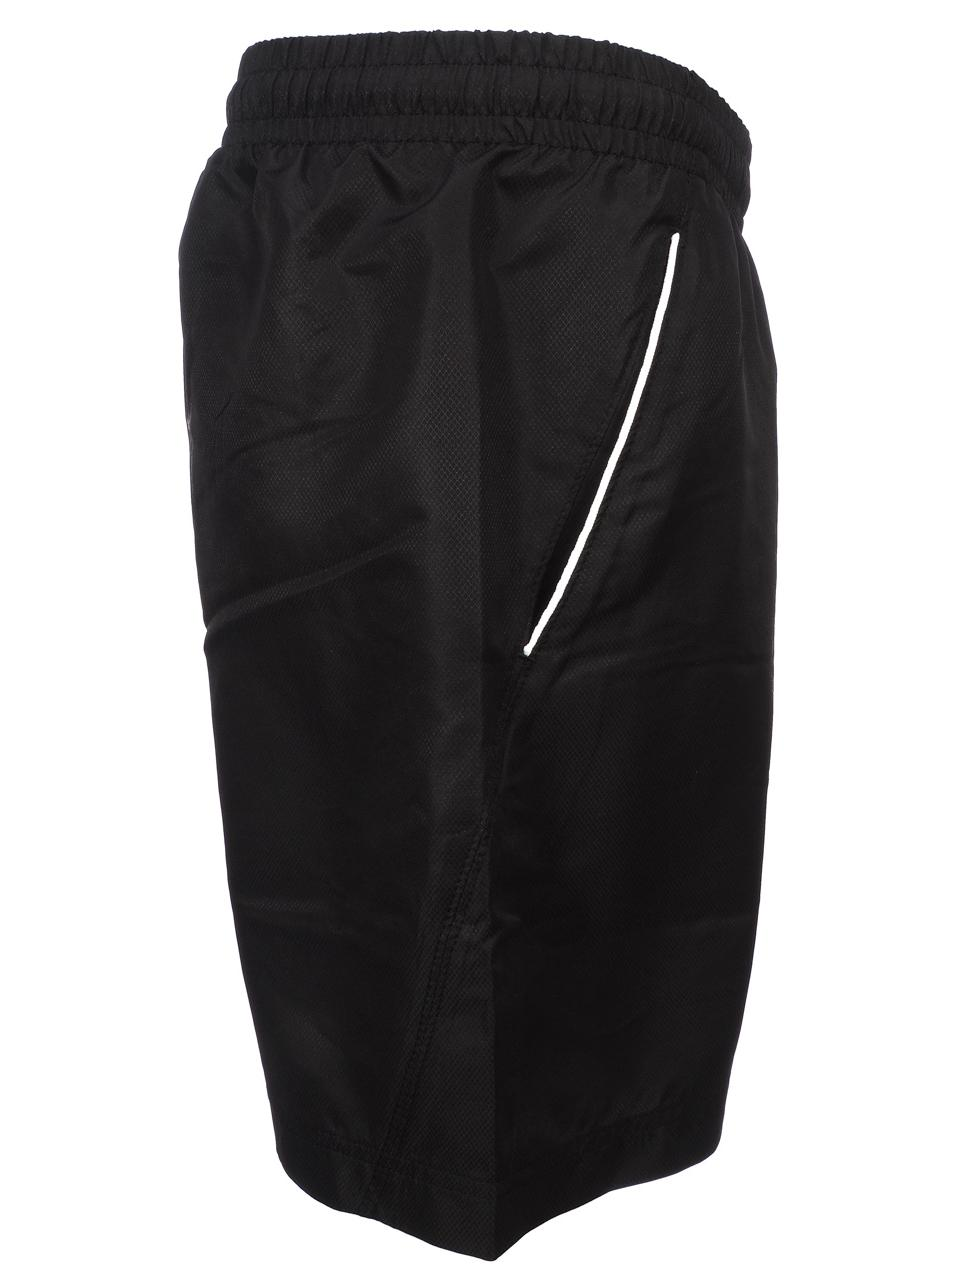 Bermuda-Shorts-Sergio-Tacchini-Rob-017-Black-Black-Shorts-45018-New thumbnail 4